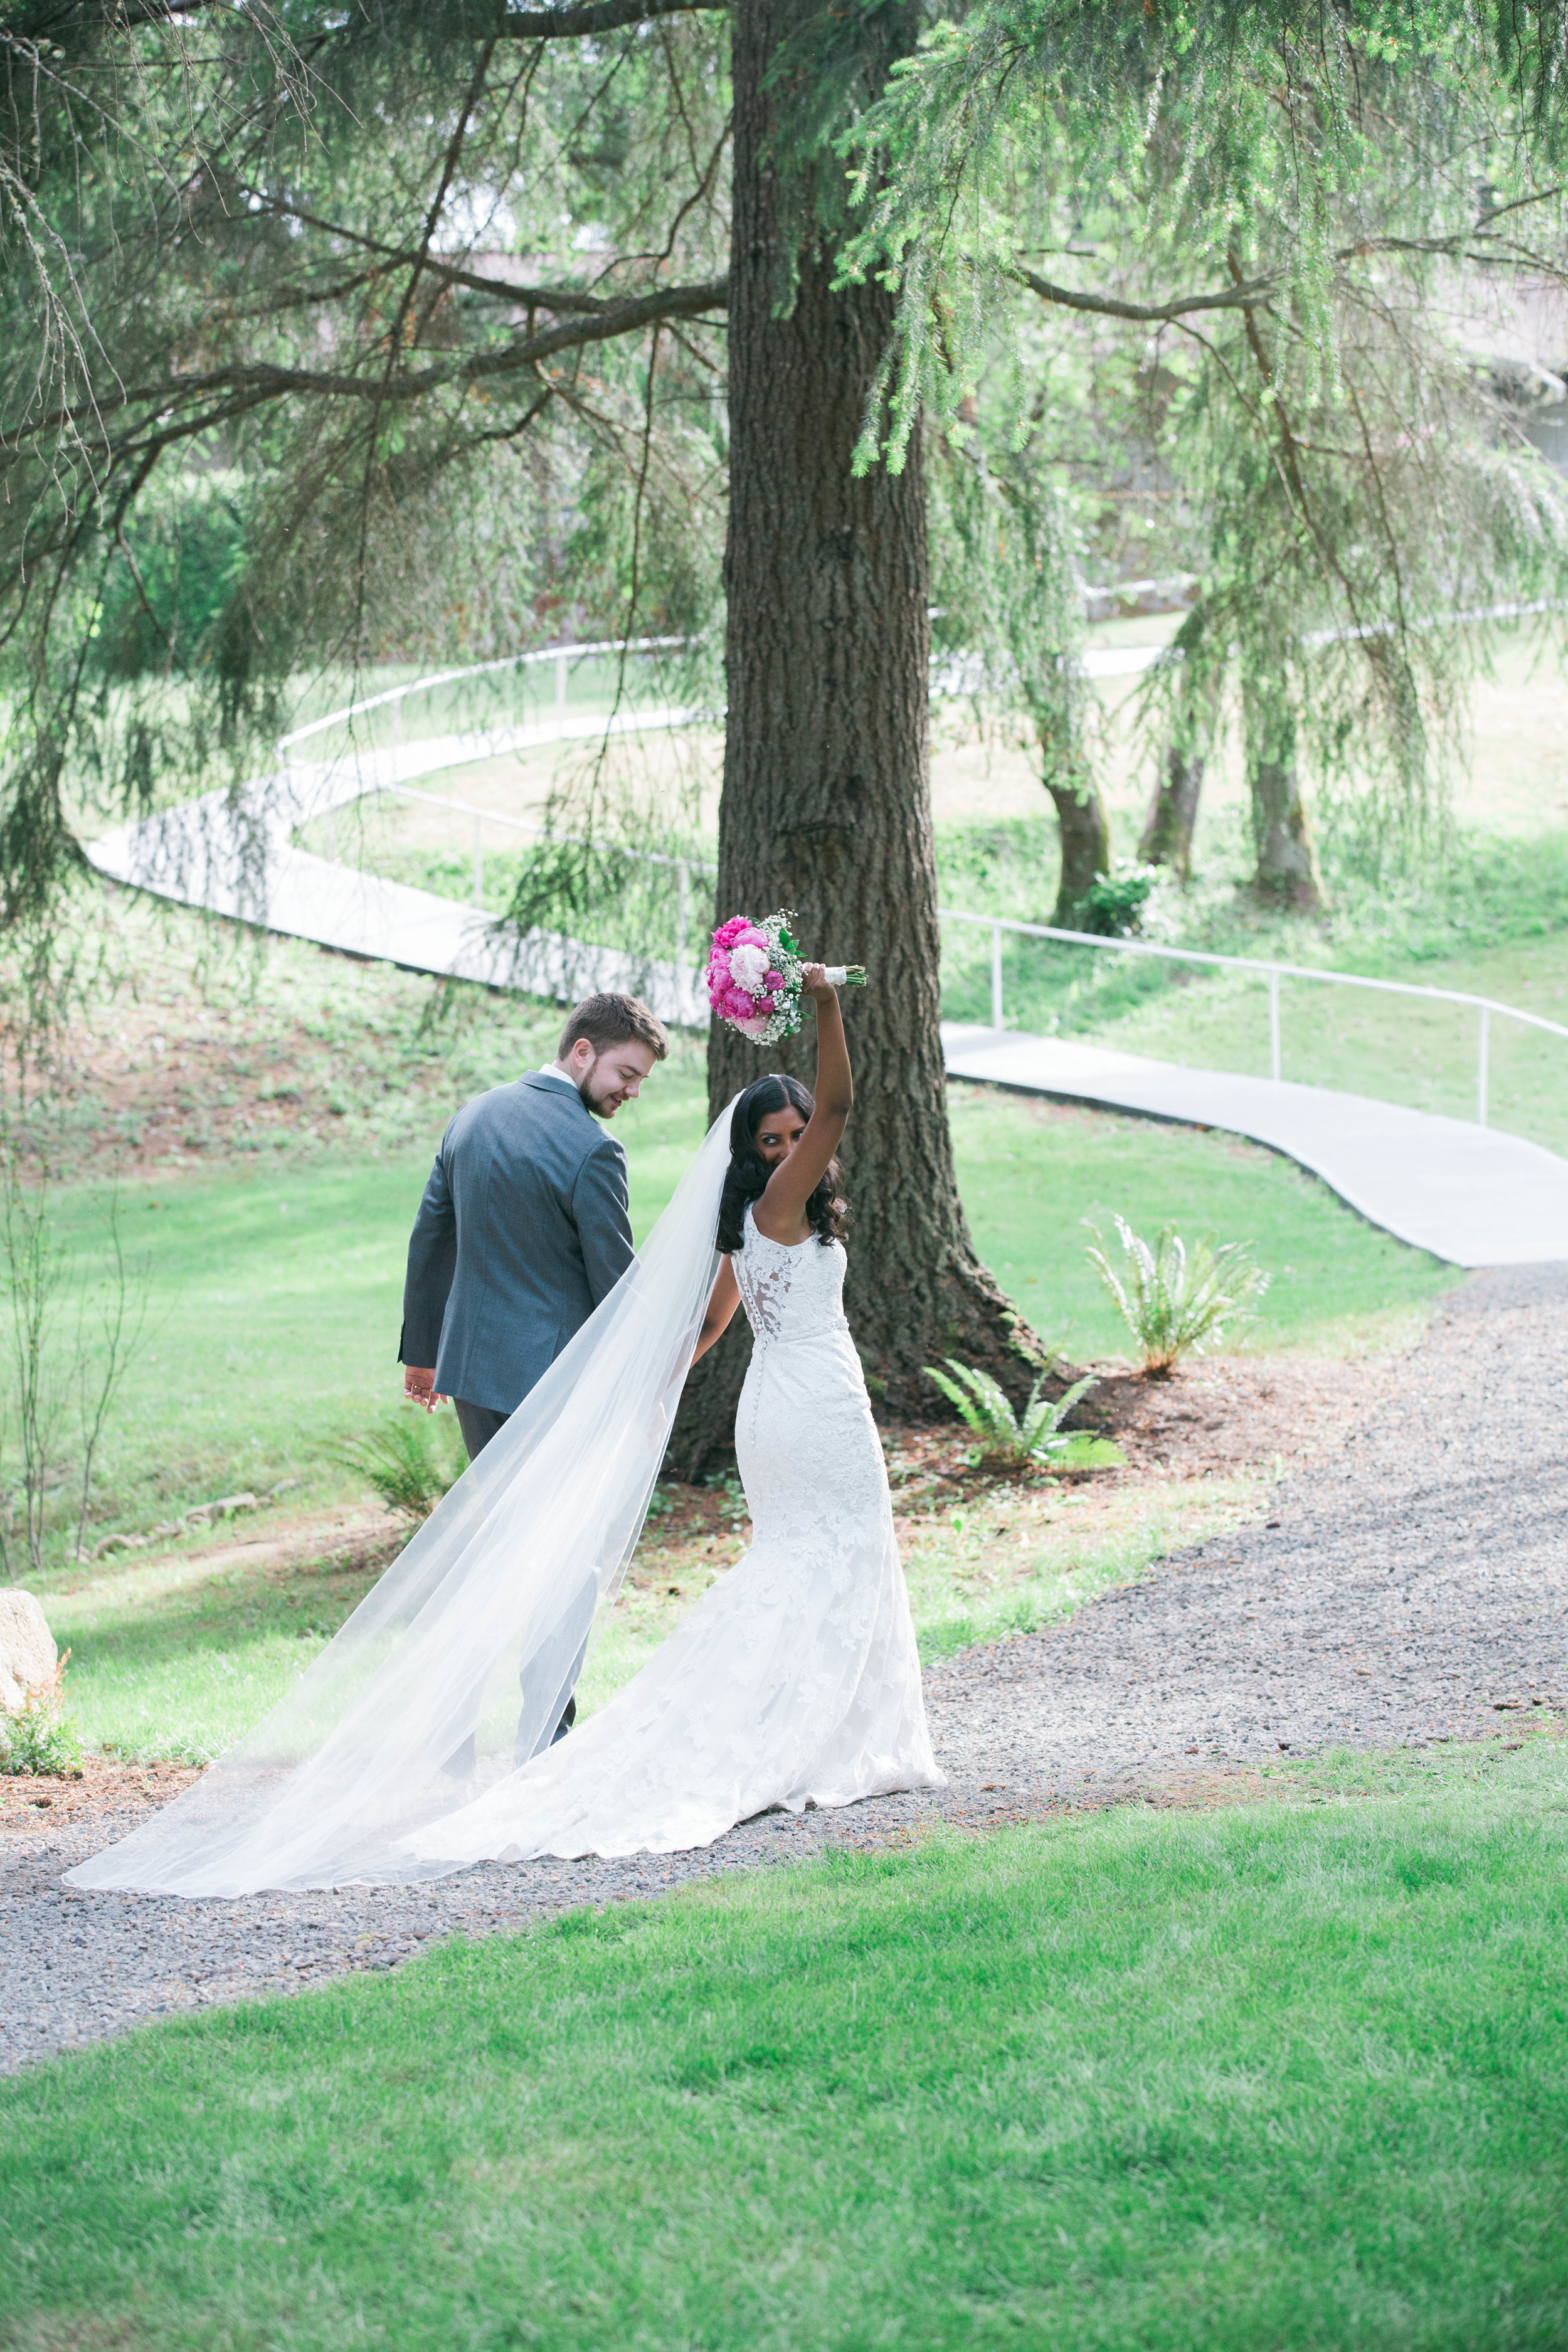 Hima+Dan_Wedding_Seattle+Couple_Kingston_6112016_1803.jpg